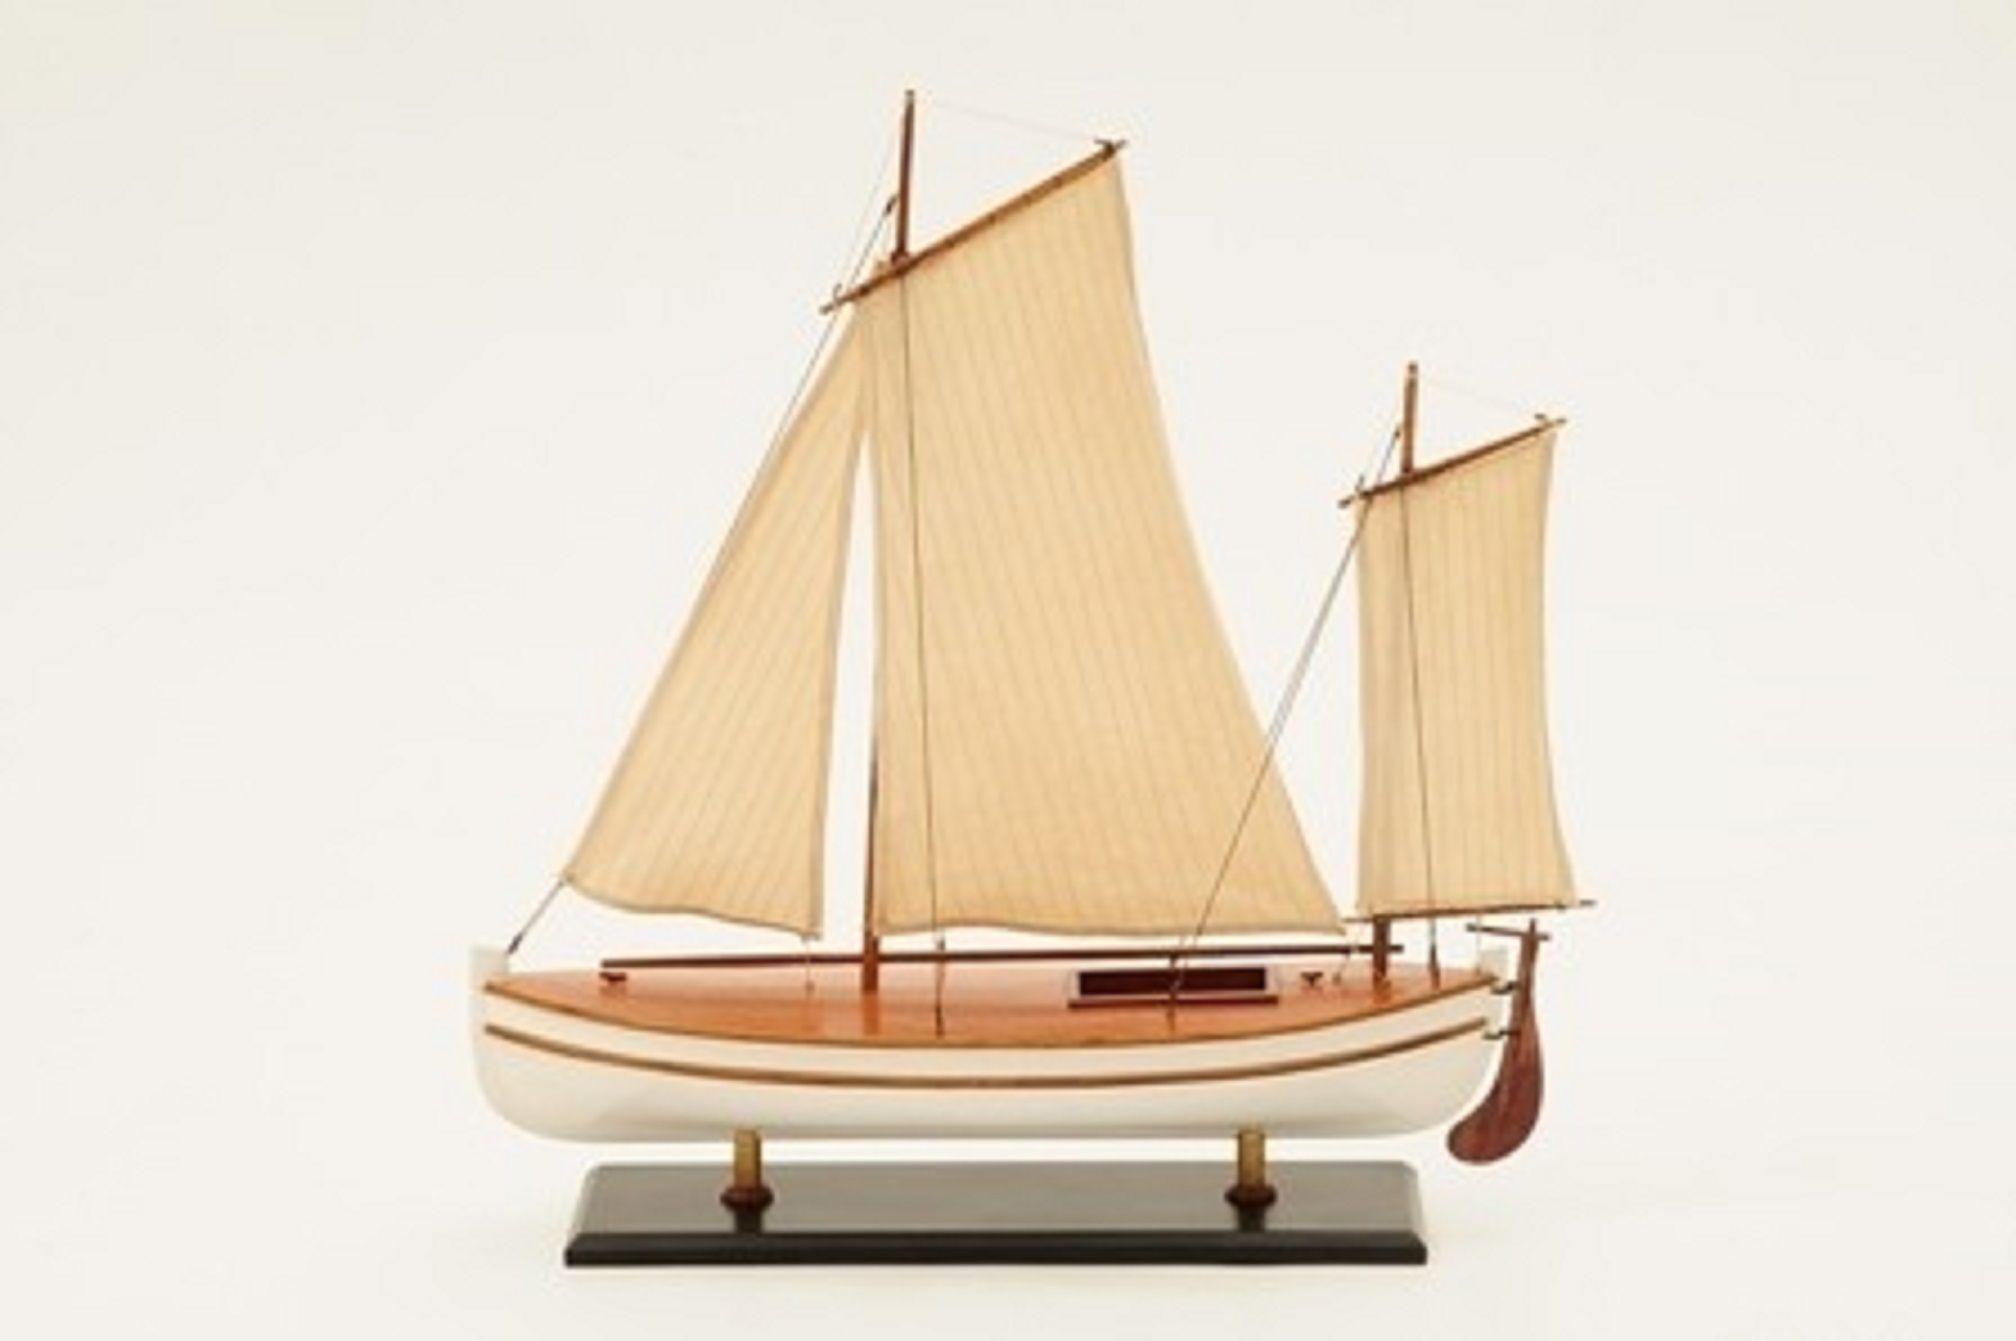 James Caird Lifeboat (HMS Endurance)